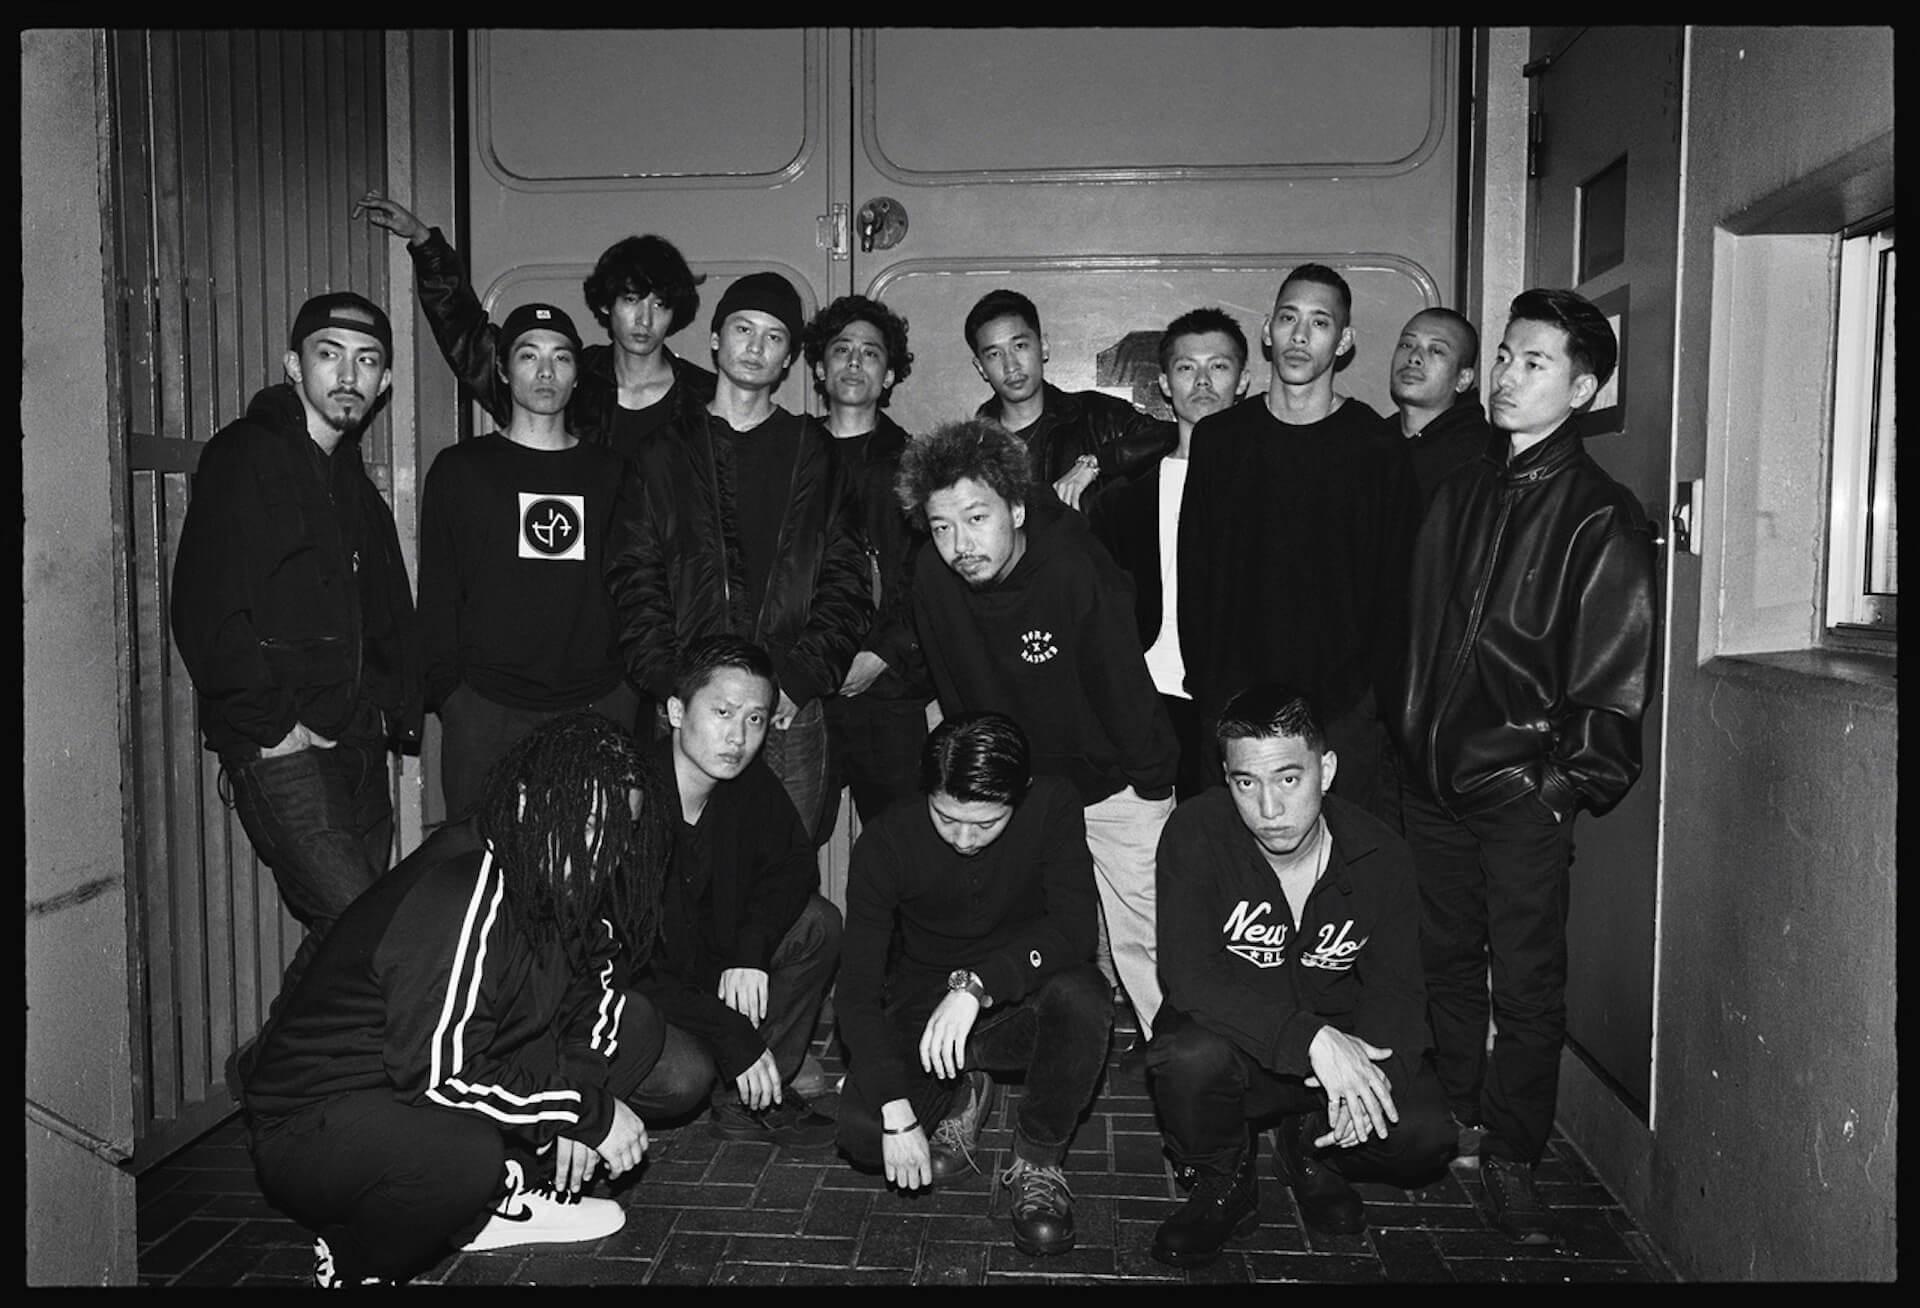 KANDYTOWN、セカンドアルバム『ADVISORY』リリースに伴いSPOT映像「SPOT ADVISORY」を公開 music190903-kandytown-1